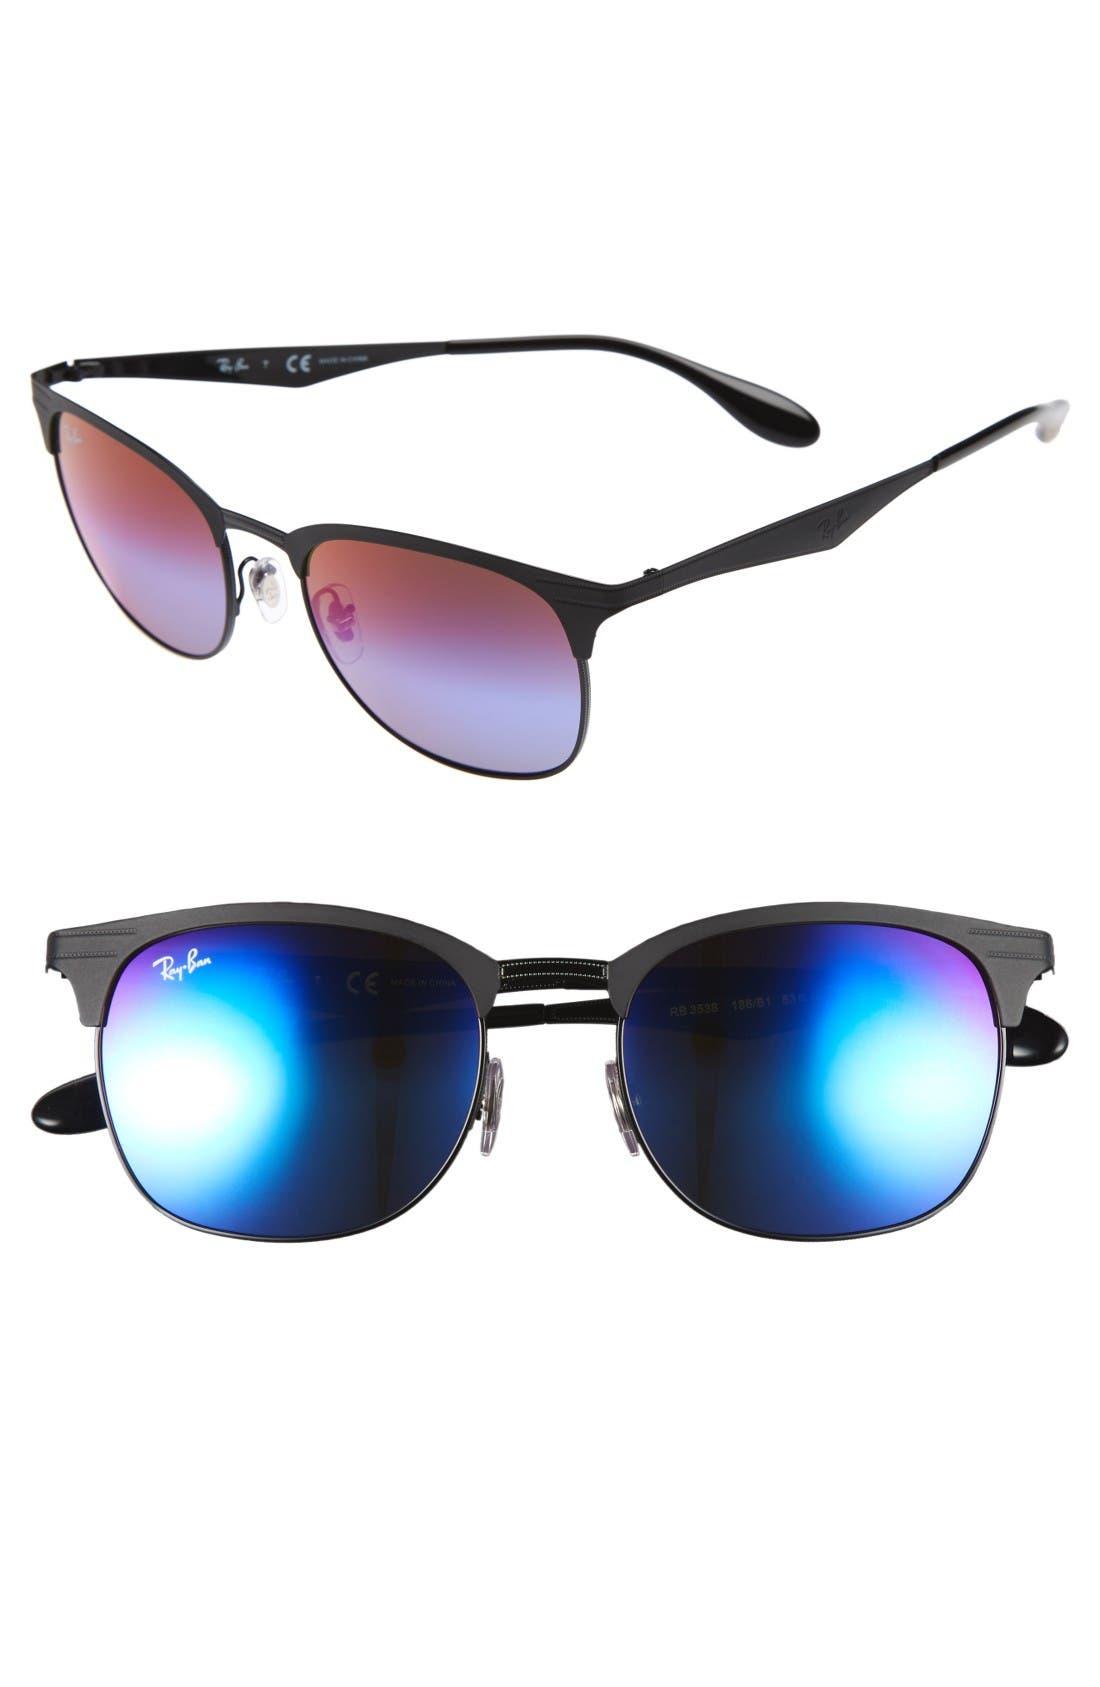 Highstreet 53mm Sunglasses,                             Main thumbnail 1, color,                             Black/ Blue